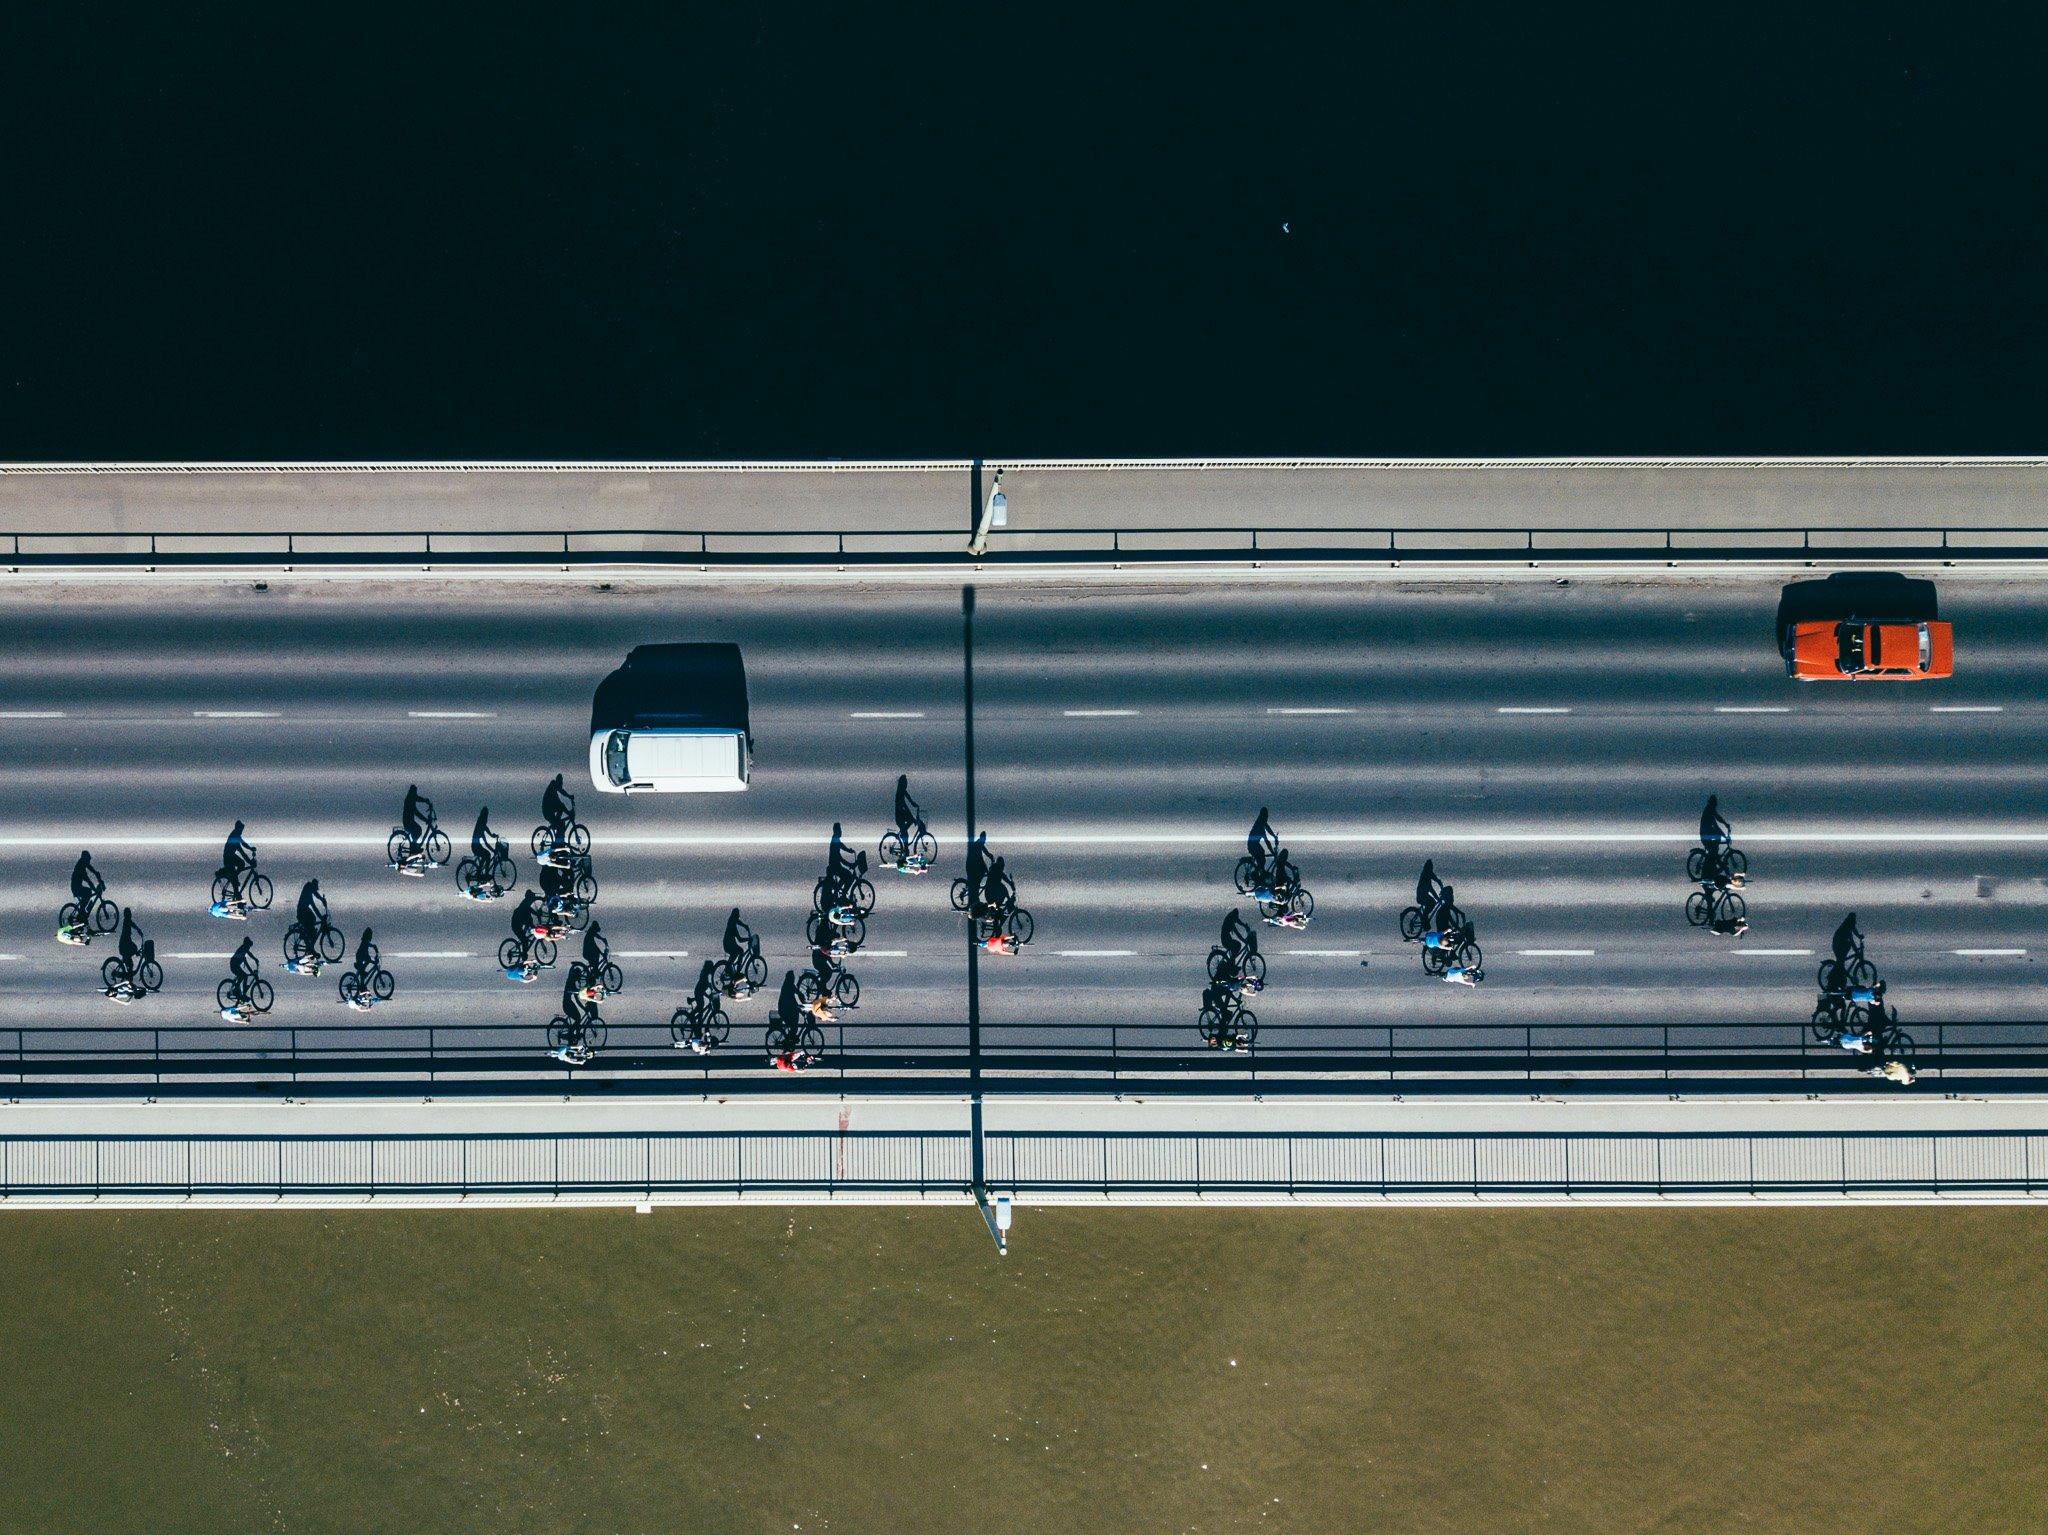 critical mass drón bicikli bertalan híd f sada domonkos